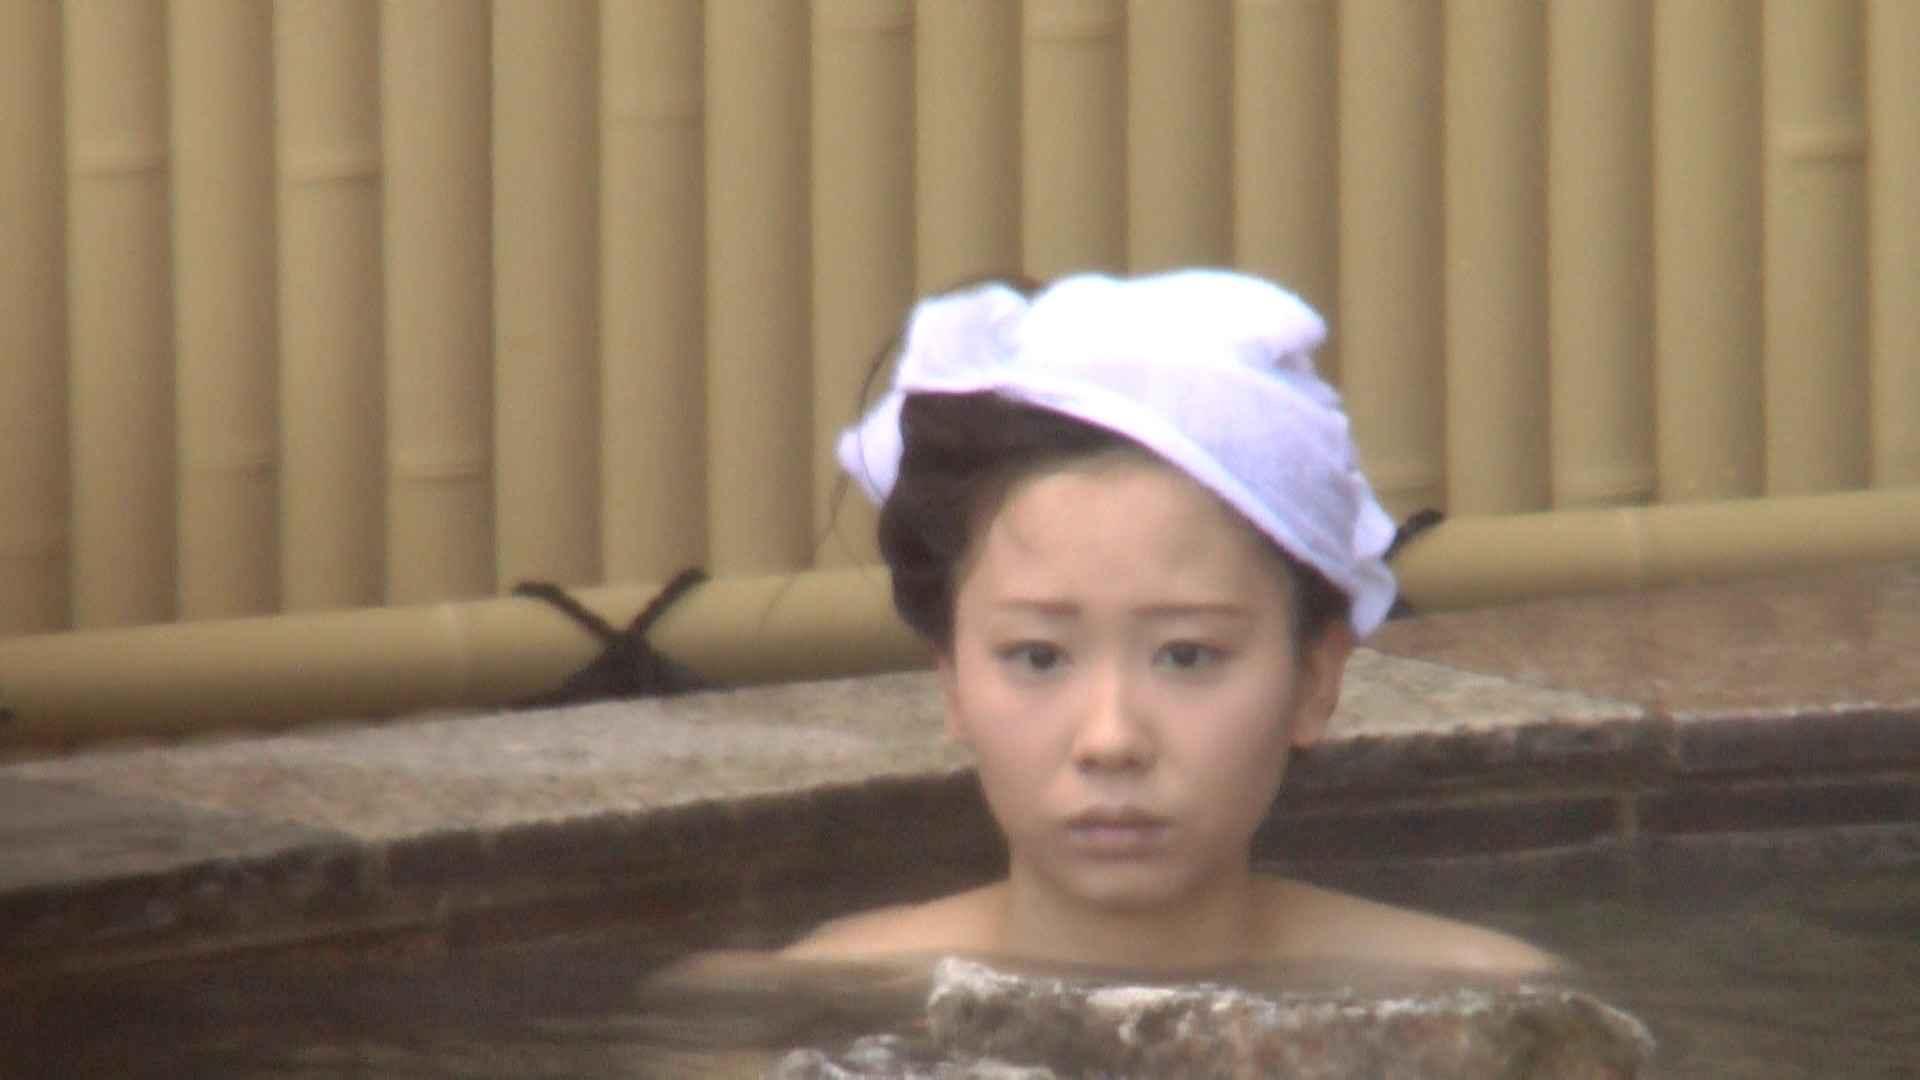 Aquaな露天風呂Vol.211 OLセックス 盗撮アダルト動画キャプチャ 68画像 8